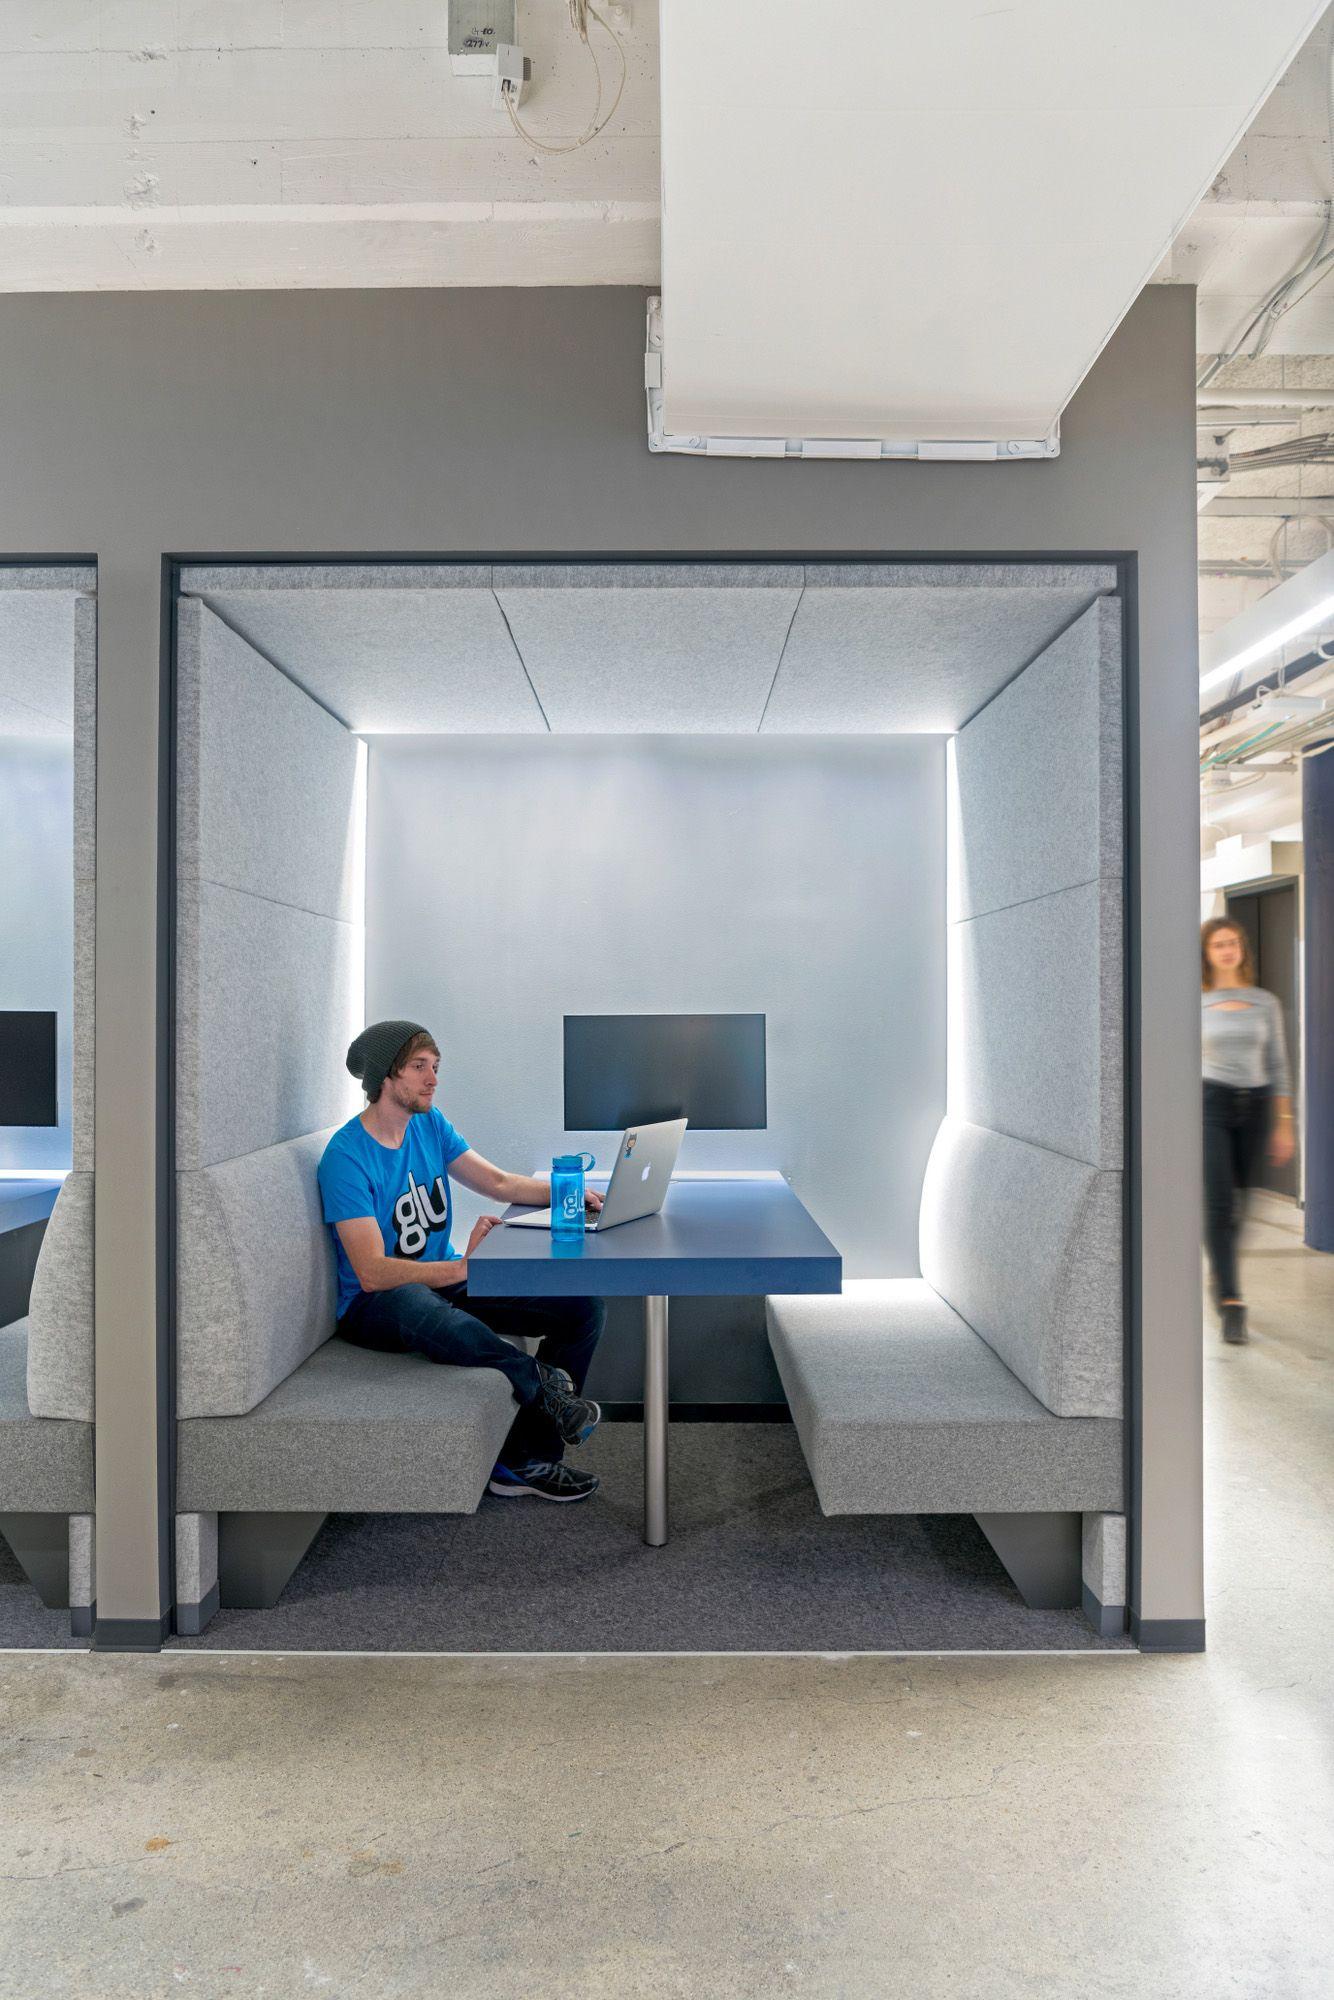 glu mobile - office snapshots   architect office interior